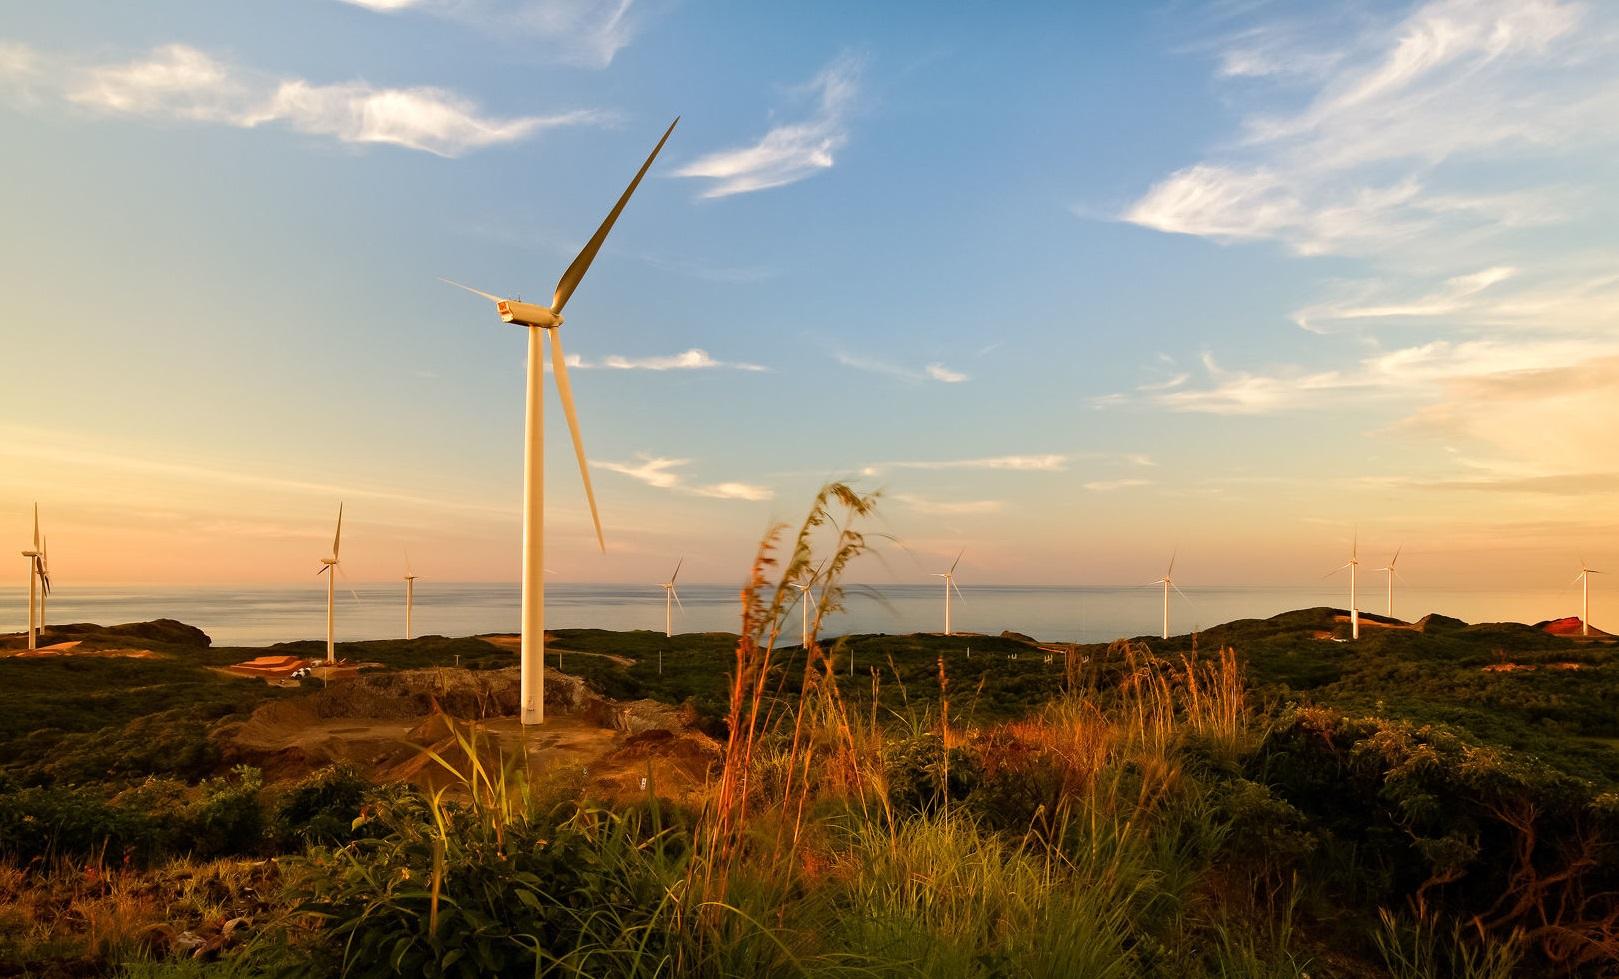 Burgos Wind farm Project - Philippines 1